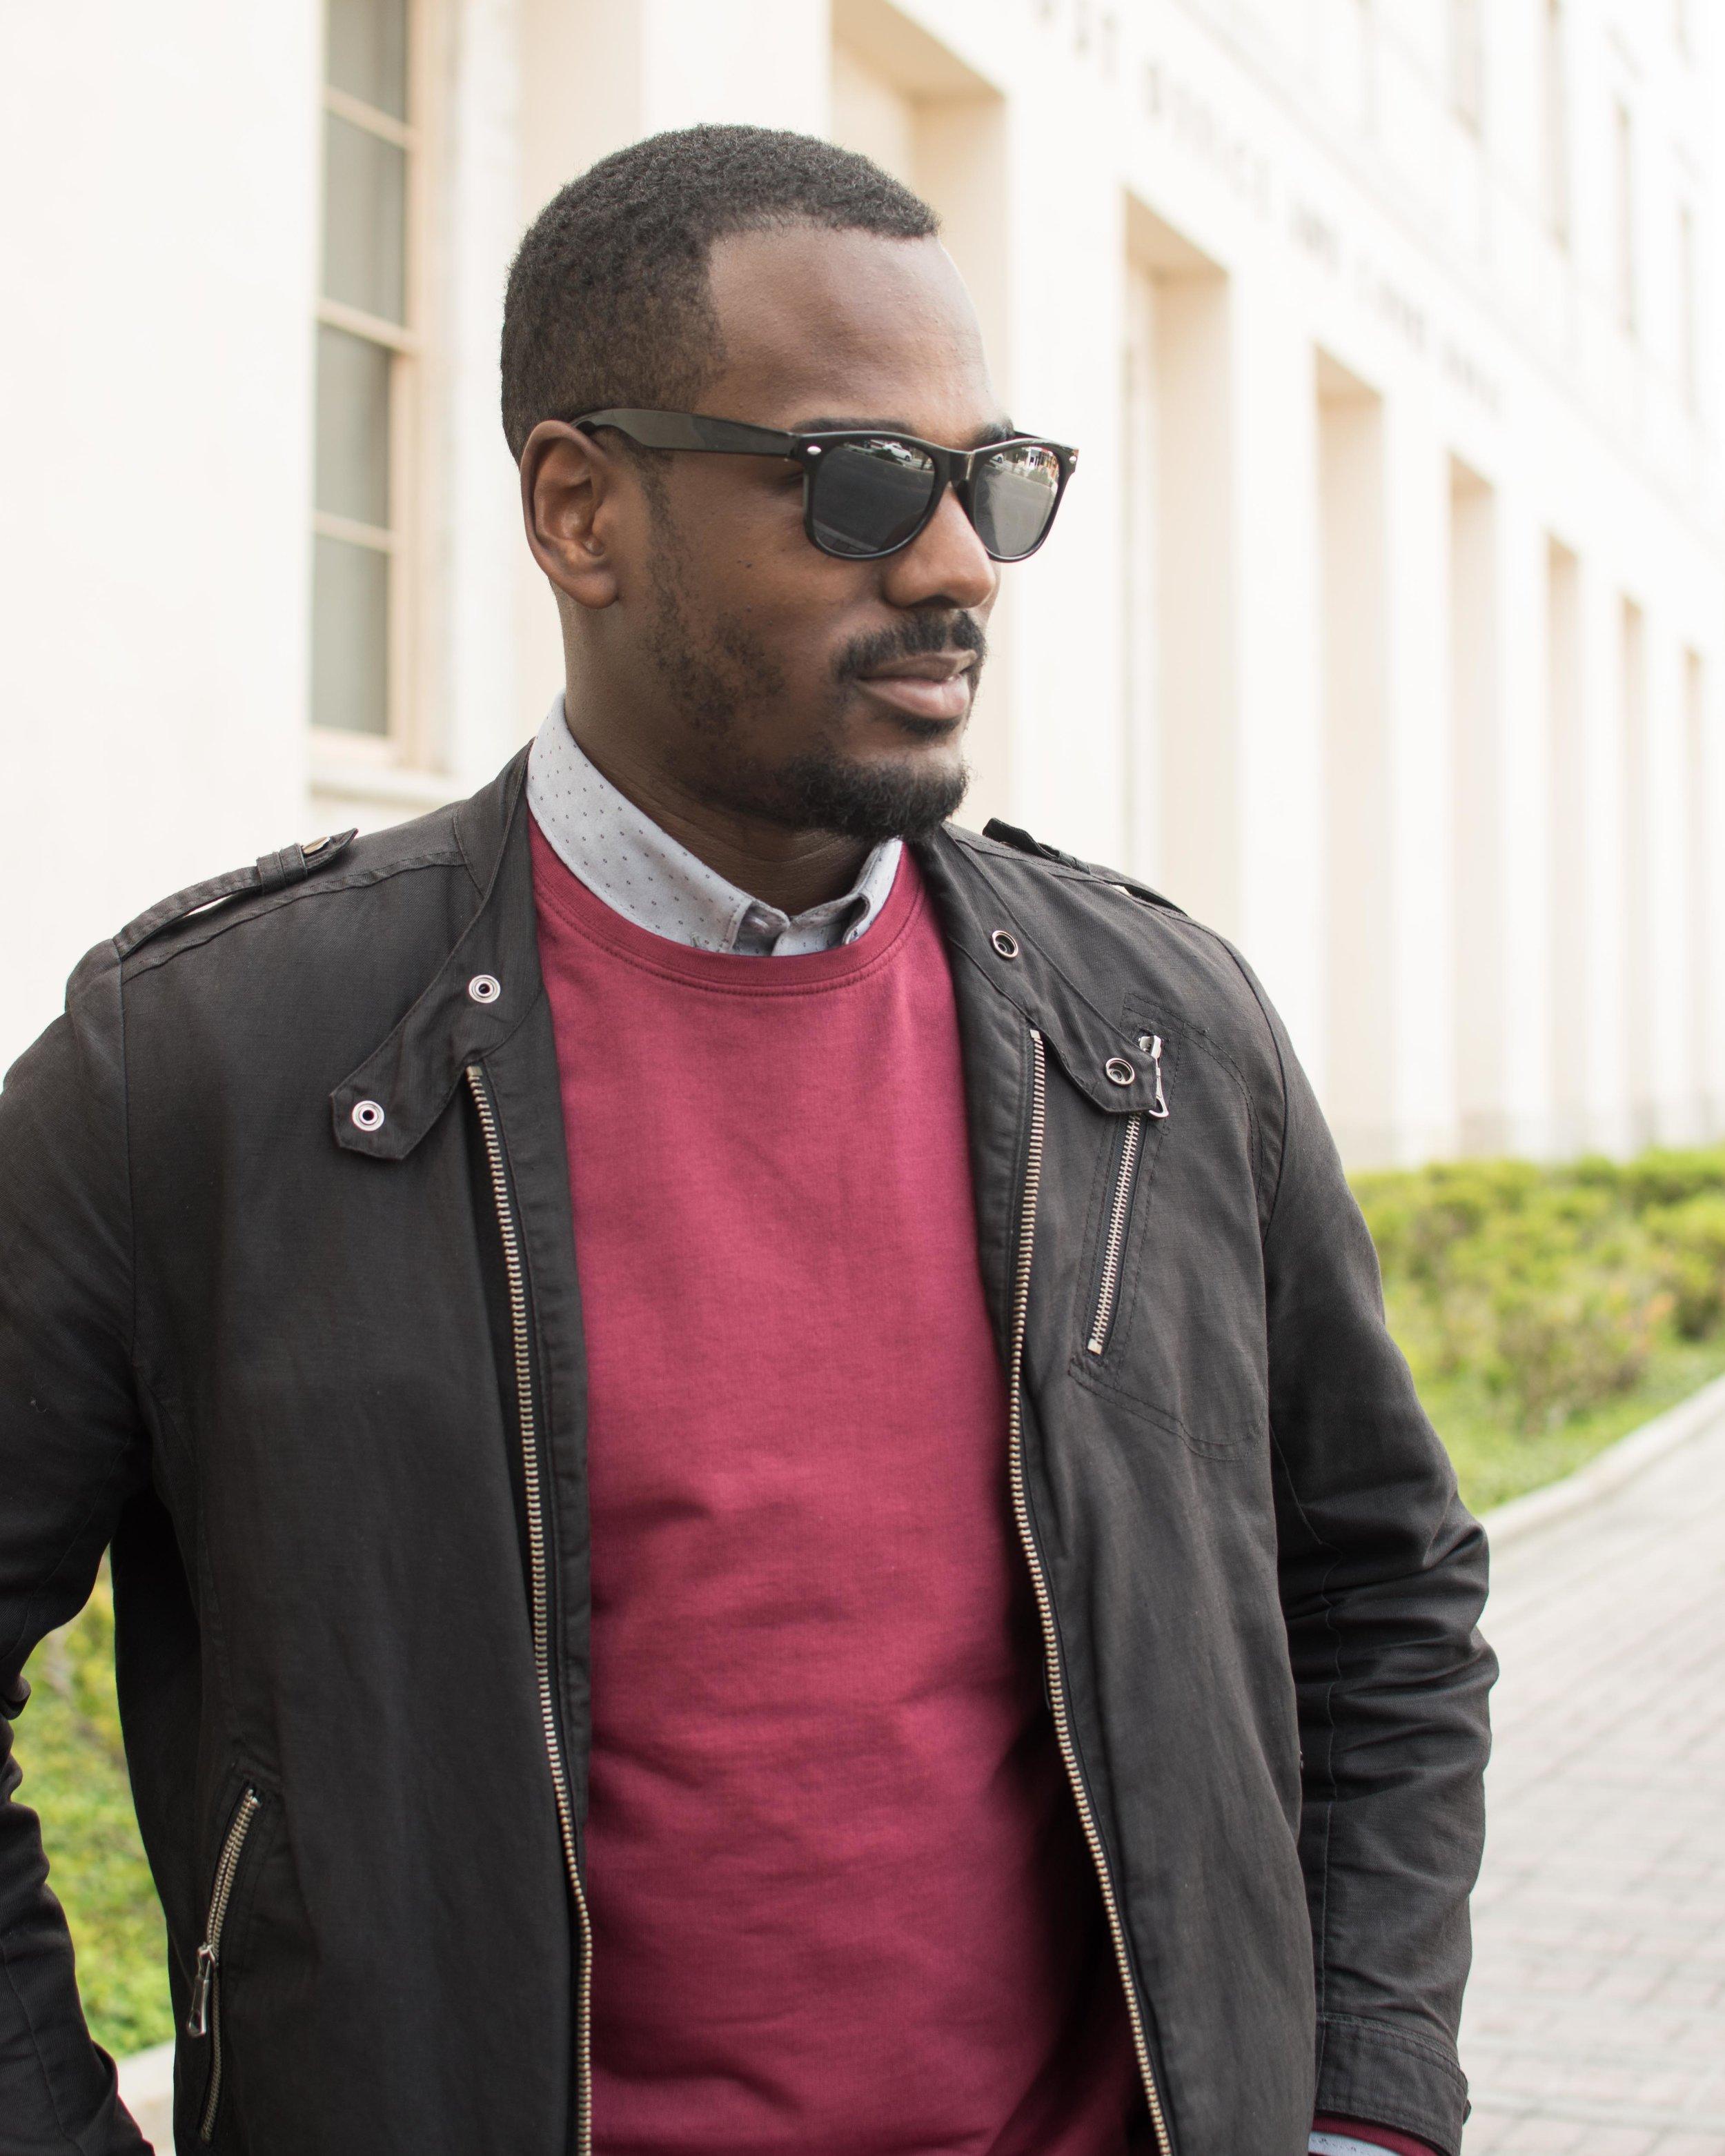 lindbergh sweater shirt details black canvas jacket